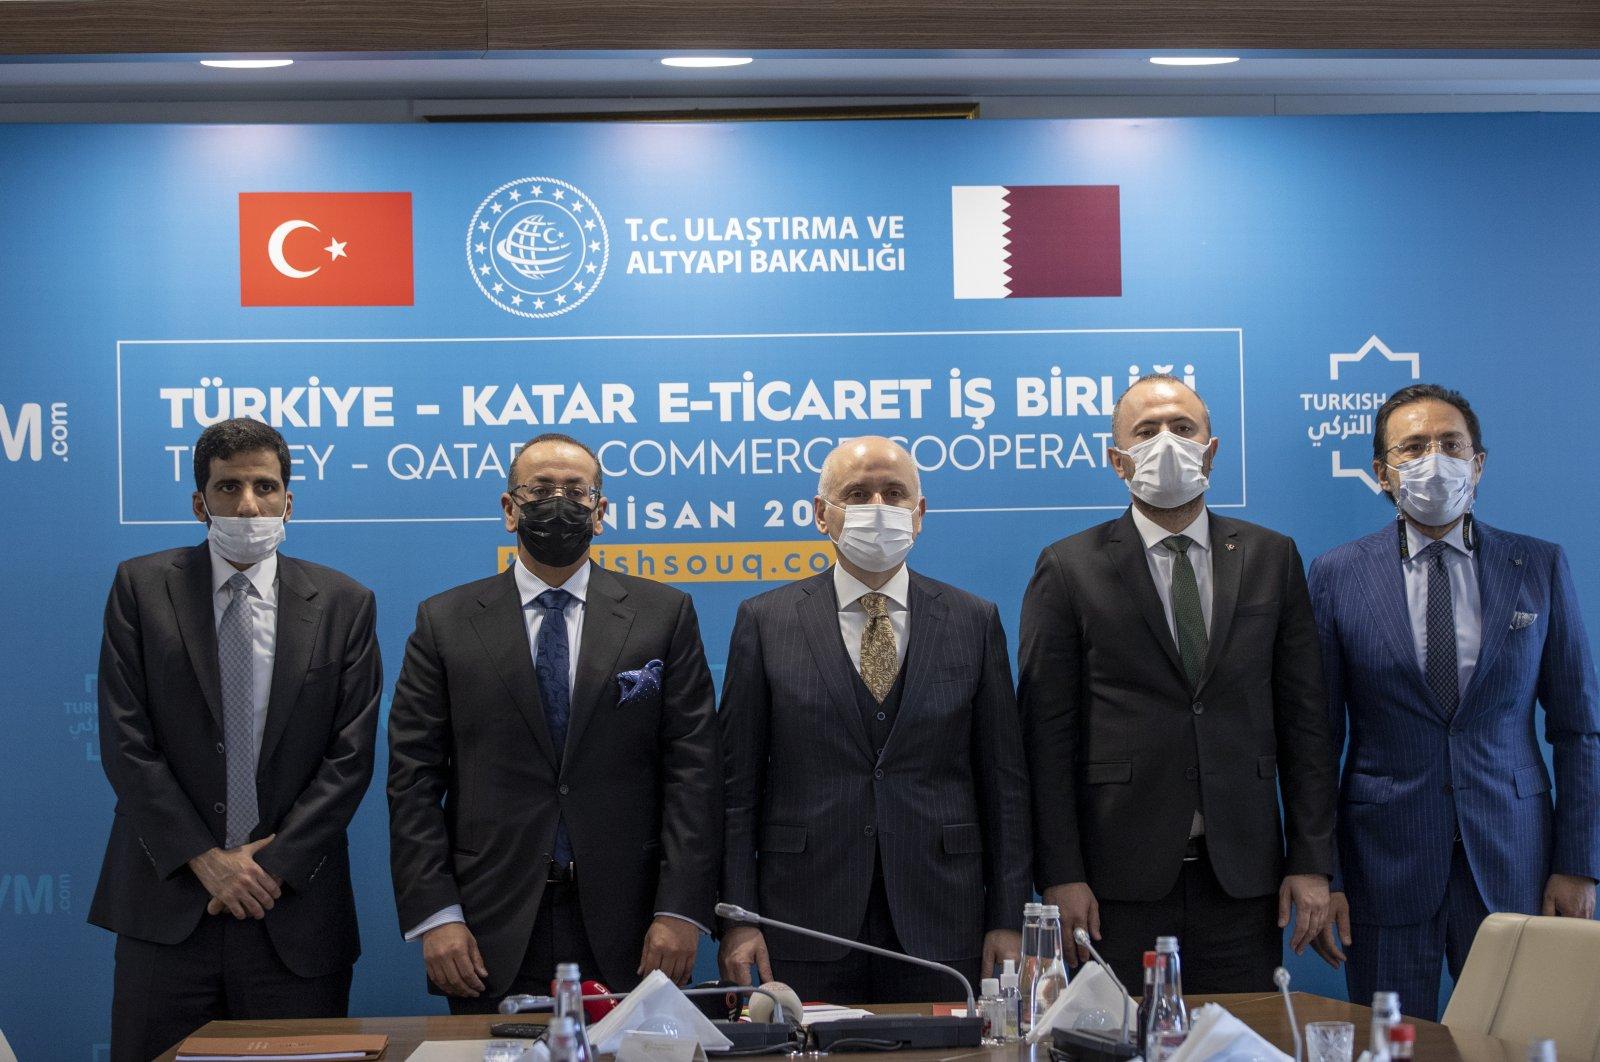 Qatar Post CEO Faleh al Naemi (2nd L) and Transportation and Infrastructure Minister Adil Karaismailoğlu (C) at a meeting for the Turkey-Qatar e-Trade Cooperation Project, Ankara, Turkey, April 6, 2021. (AA Photo)